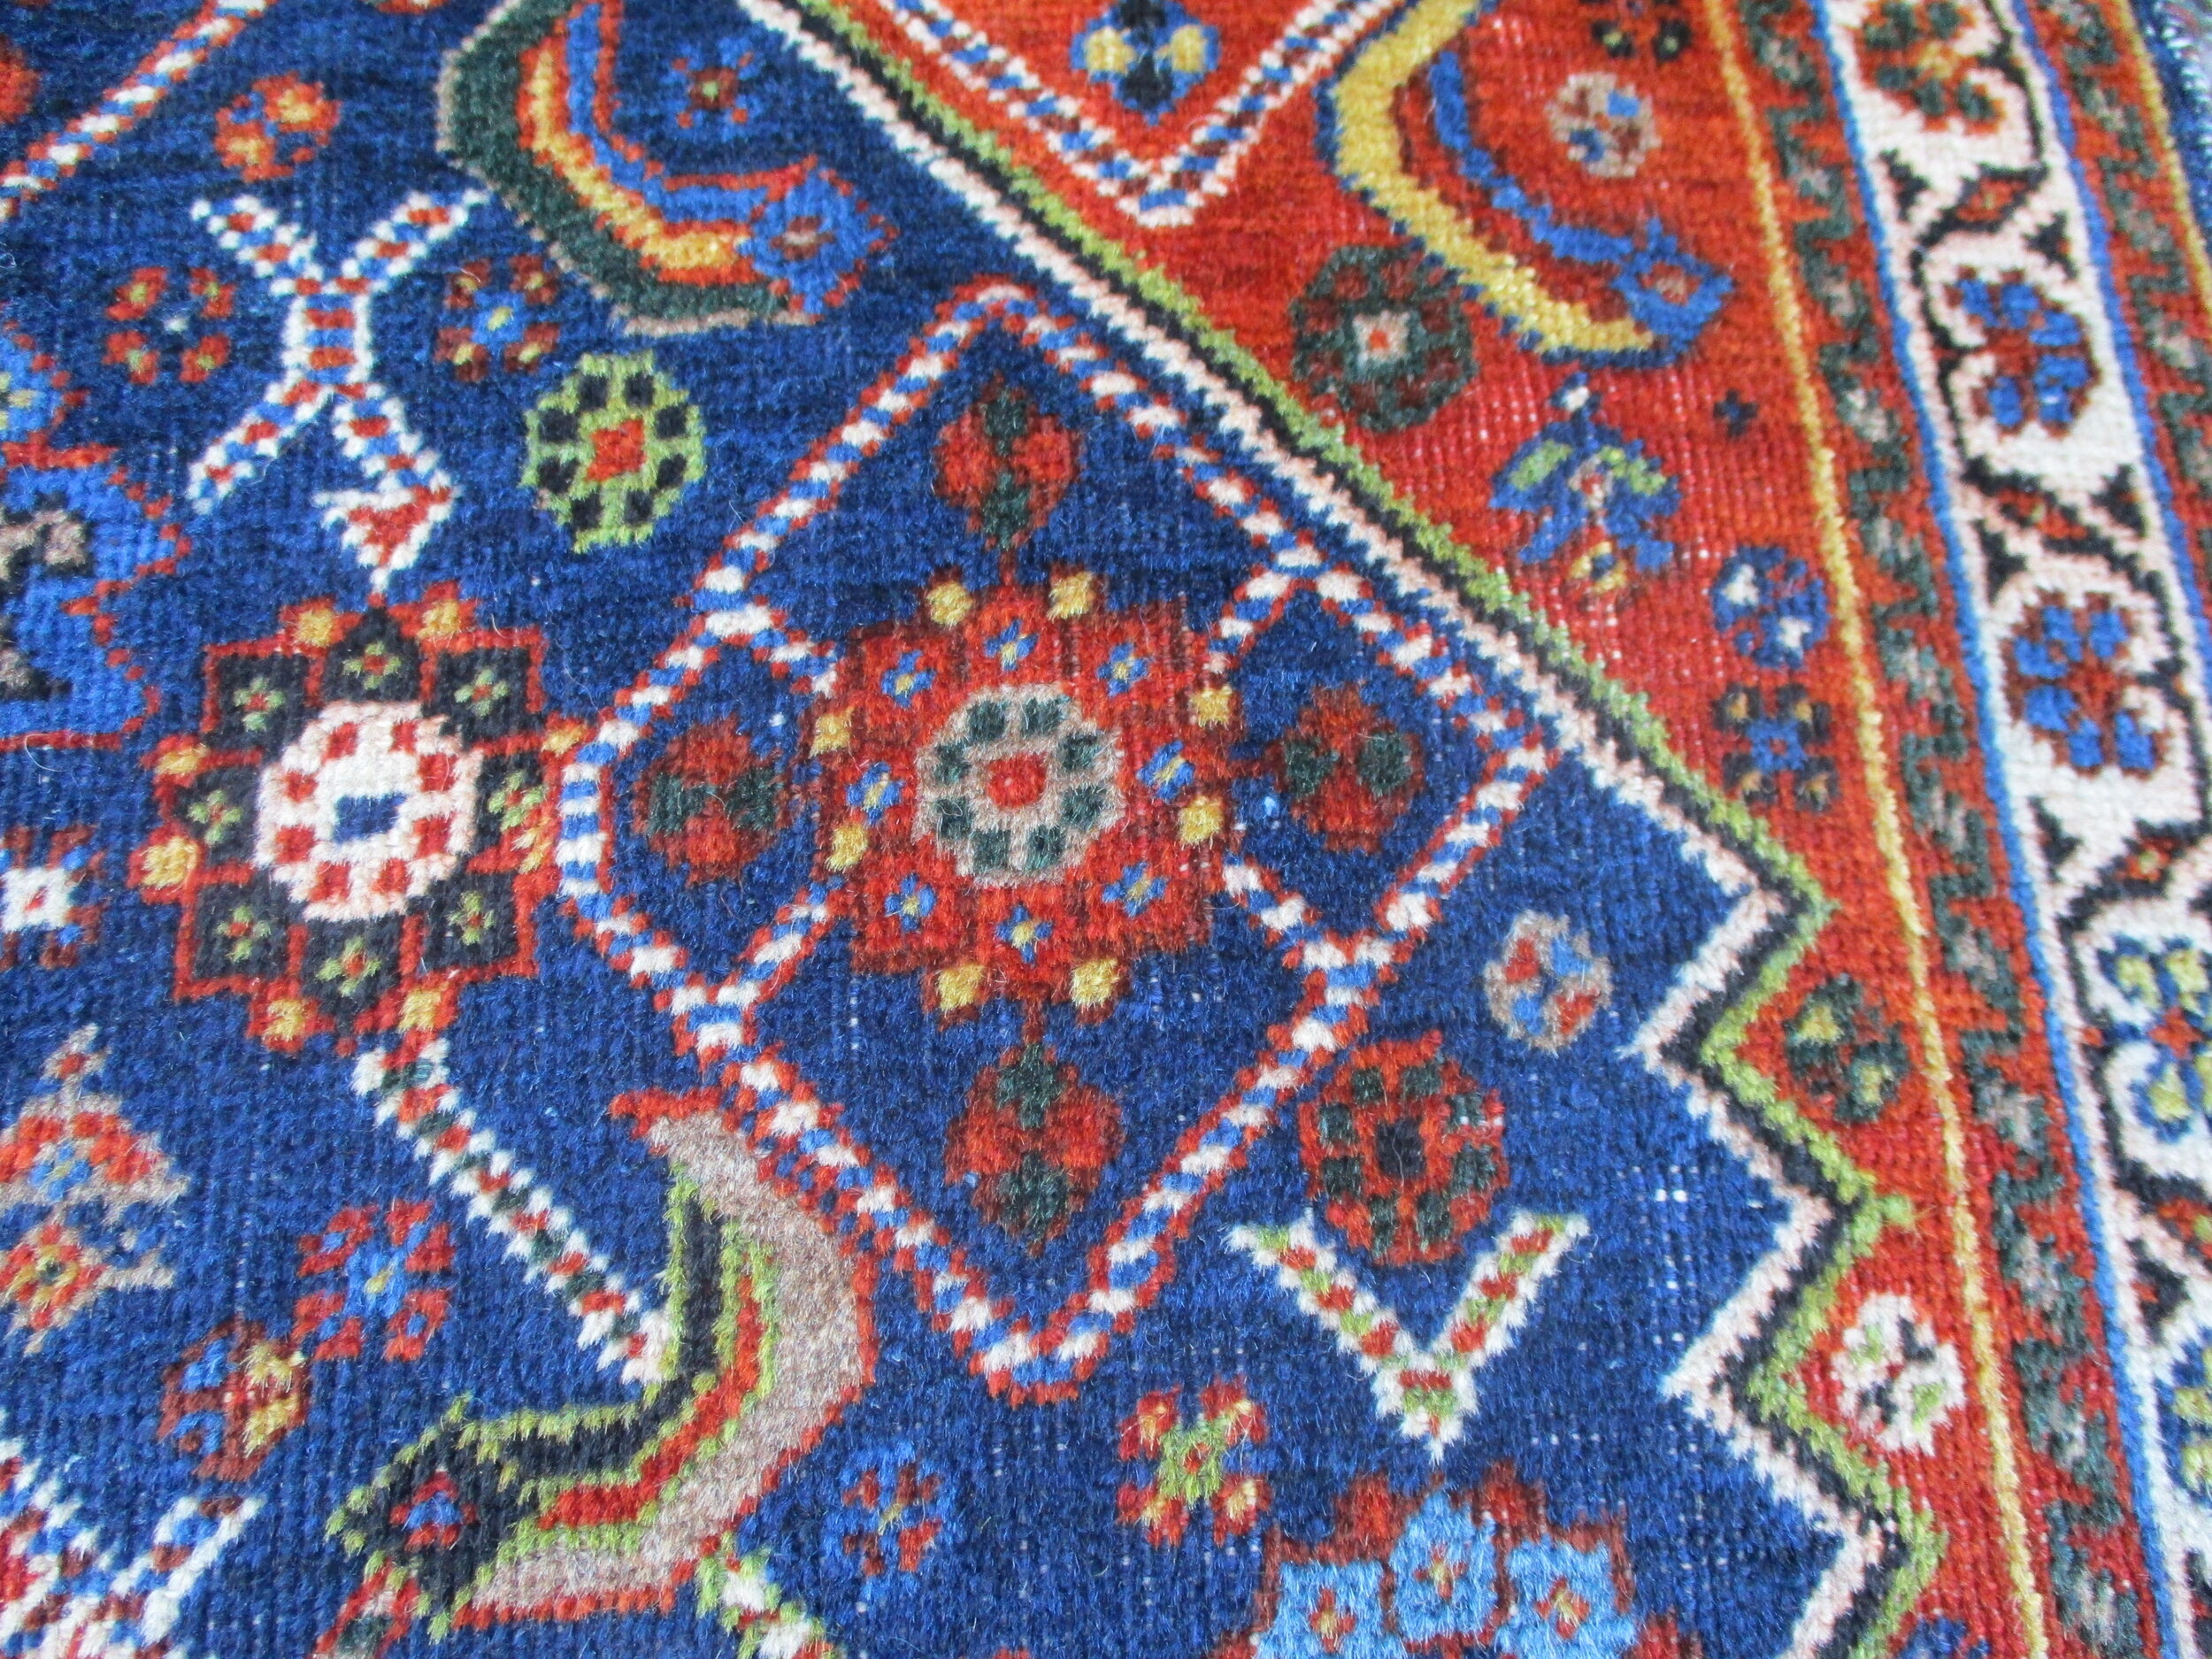 Antique Qashqai (Persian) bagface, close-up.